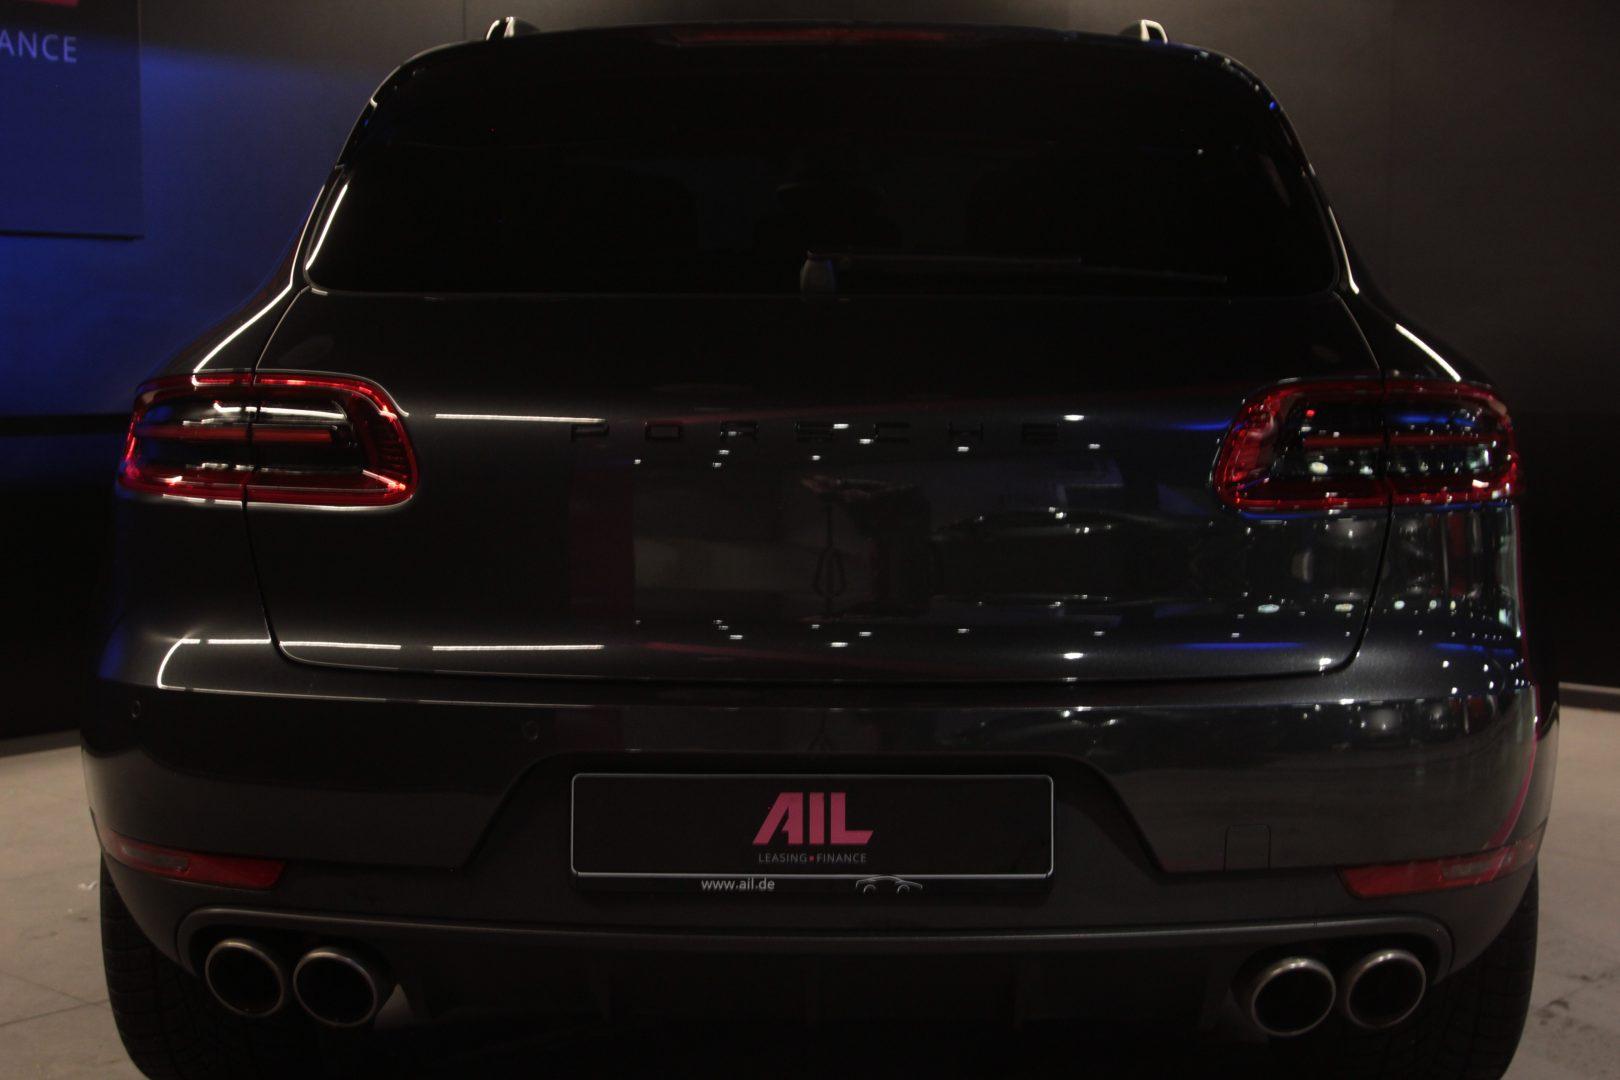 AIL Porsche Macan S Diesel 14